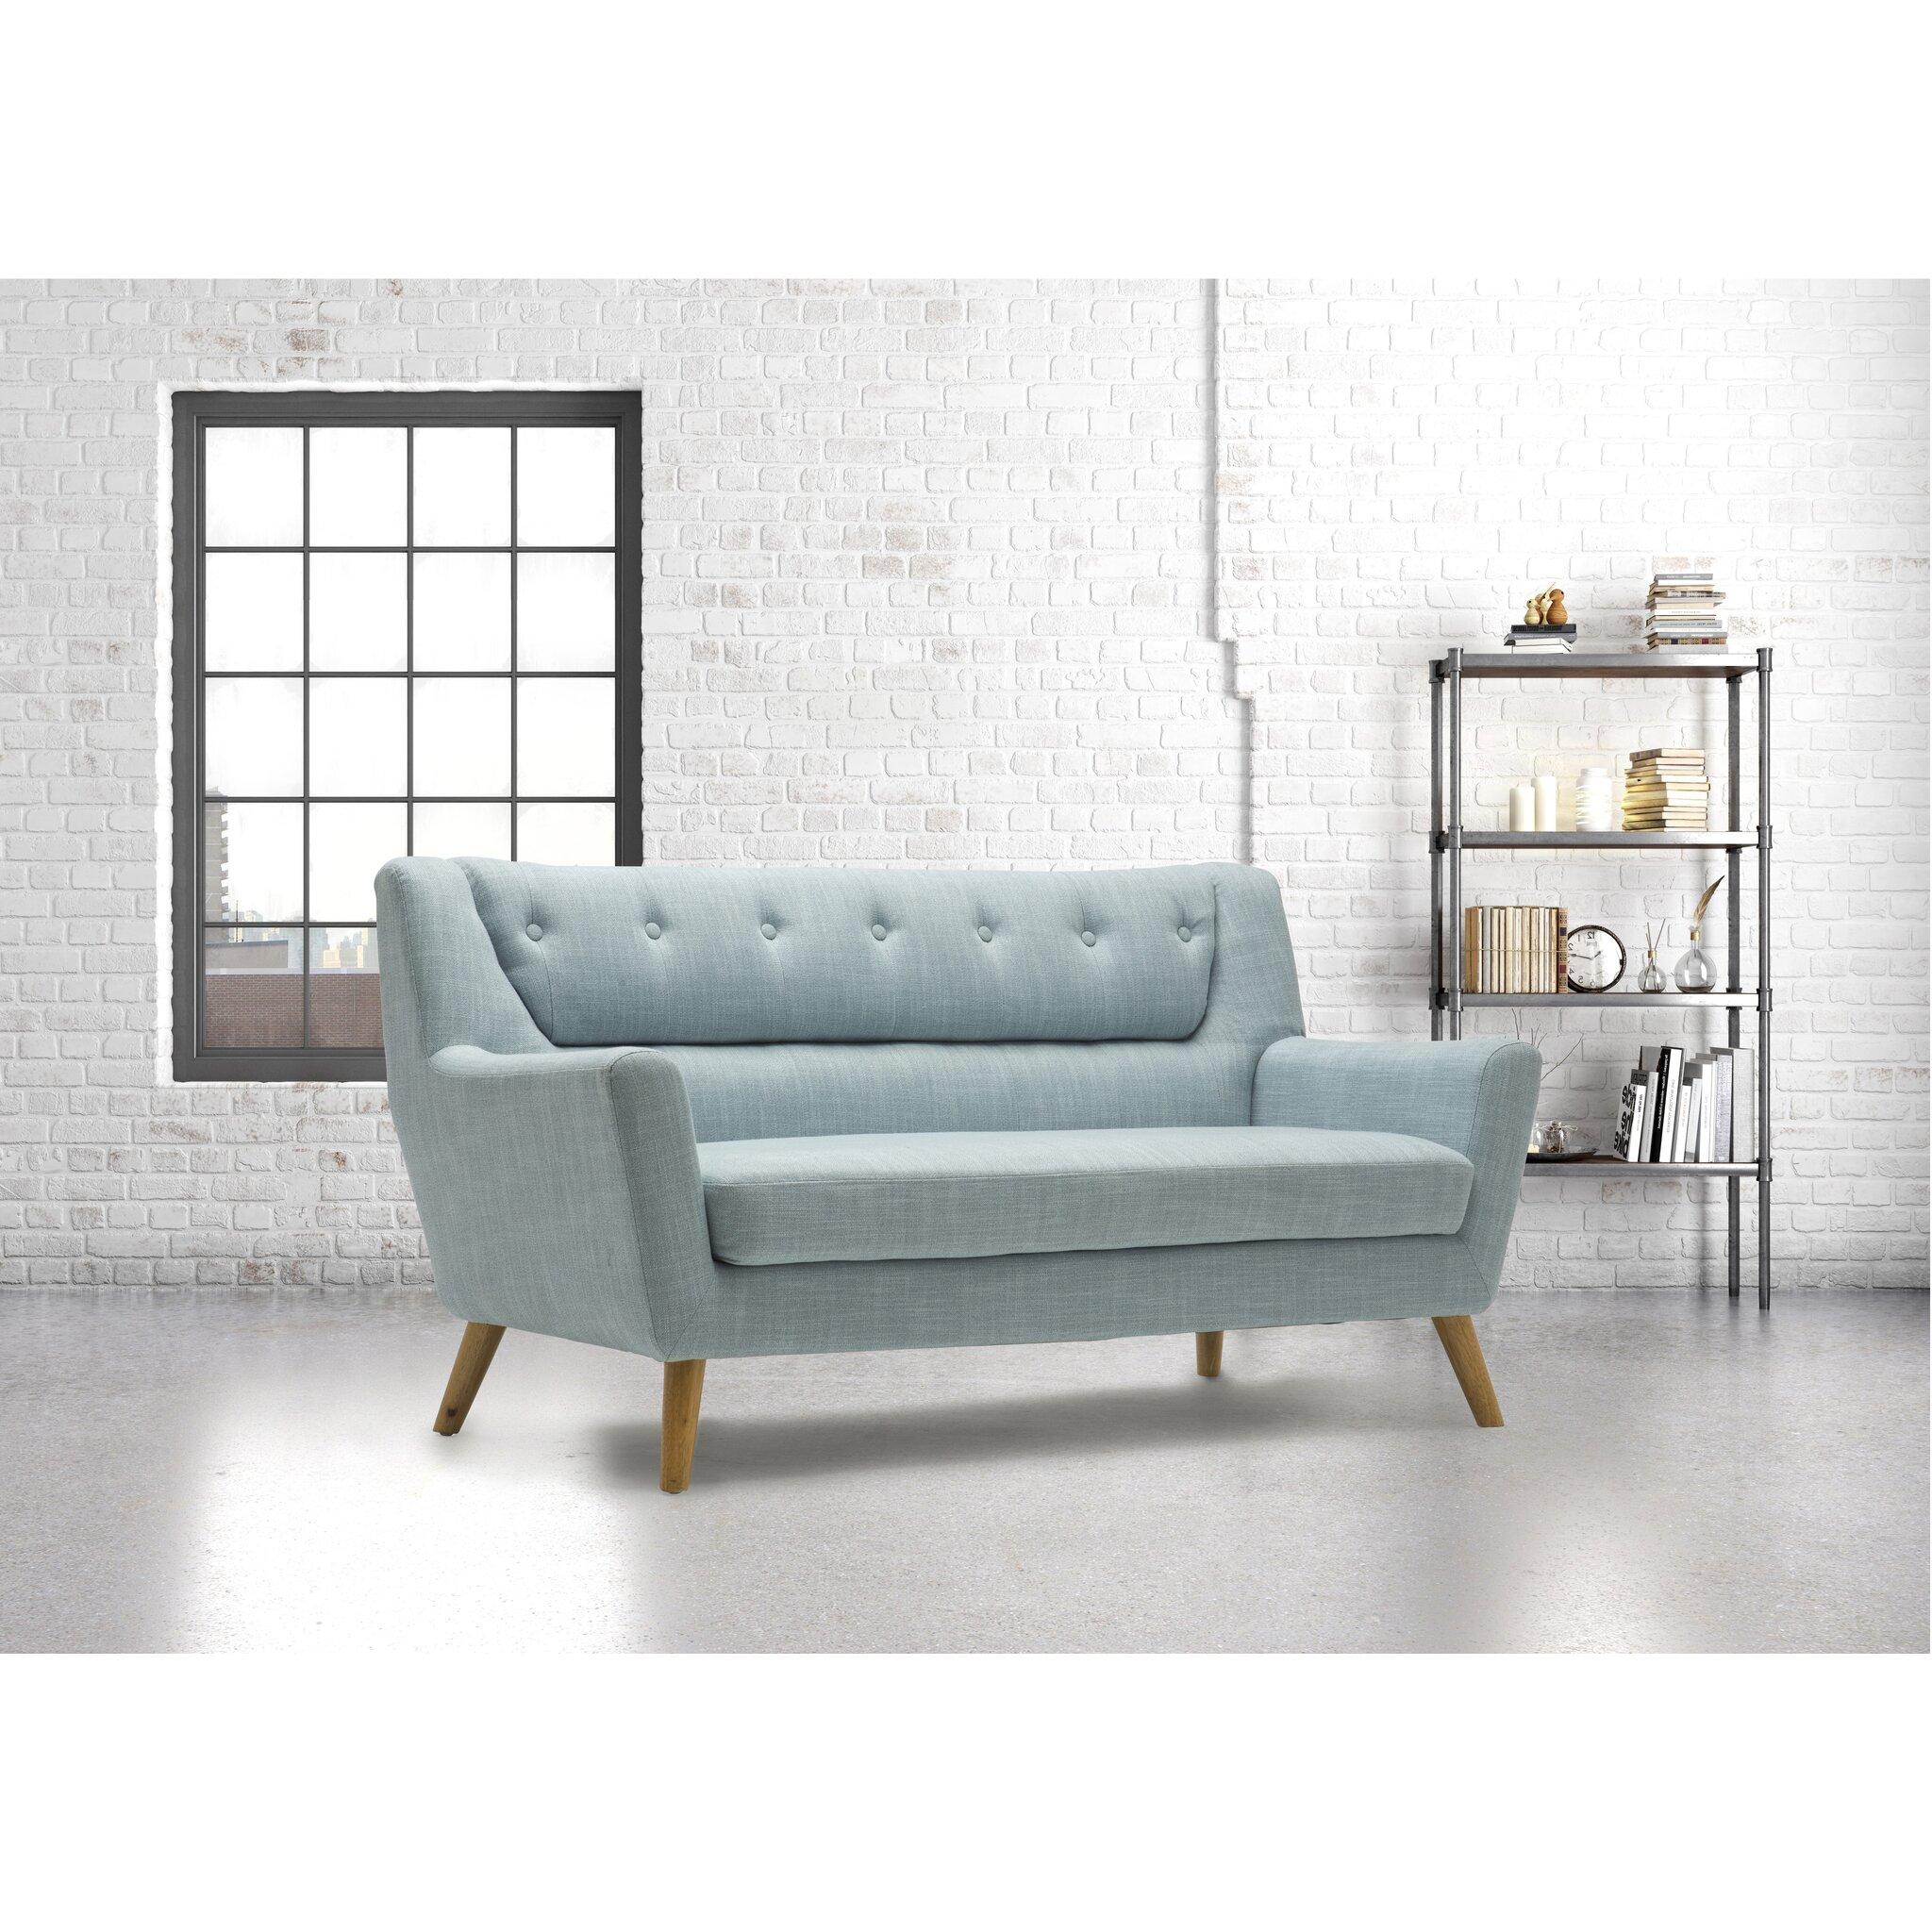 Home & Haus Lambeth 3 Seater Sofa